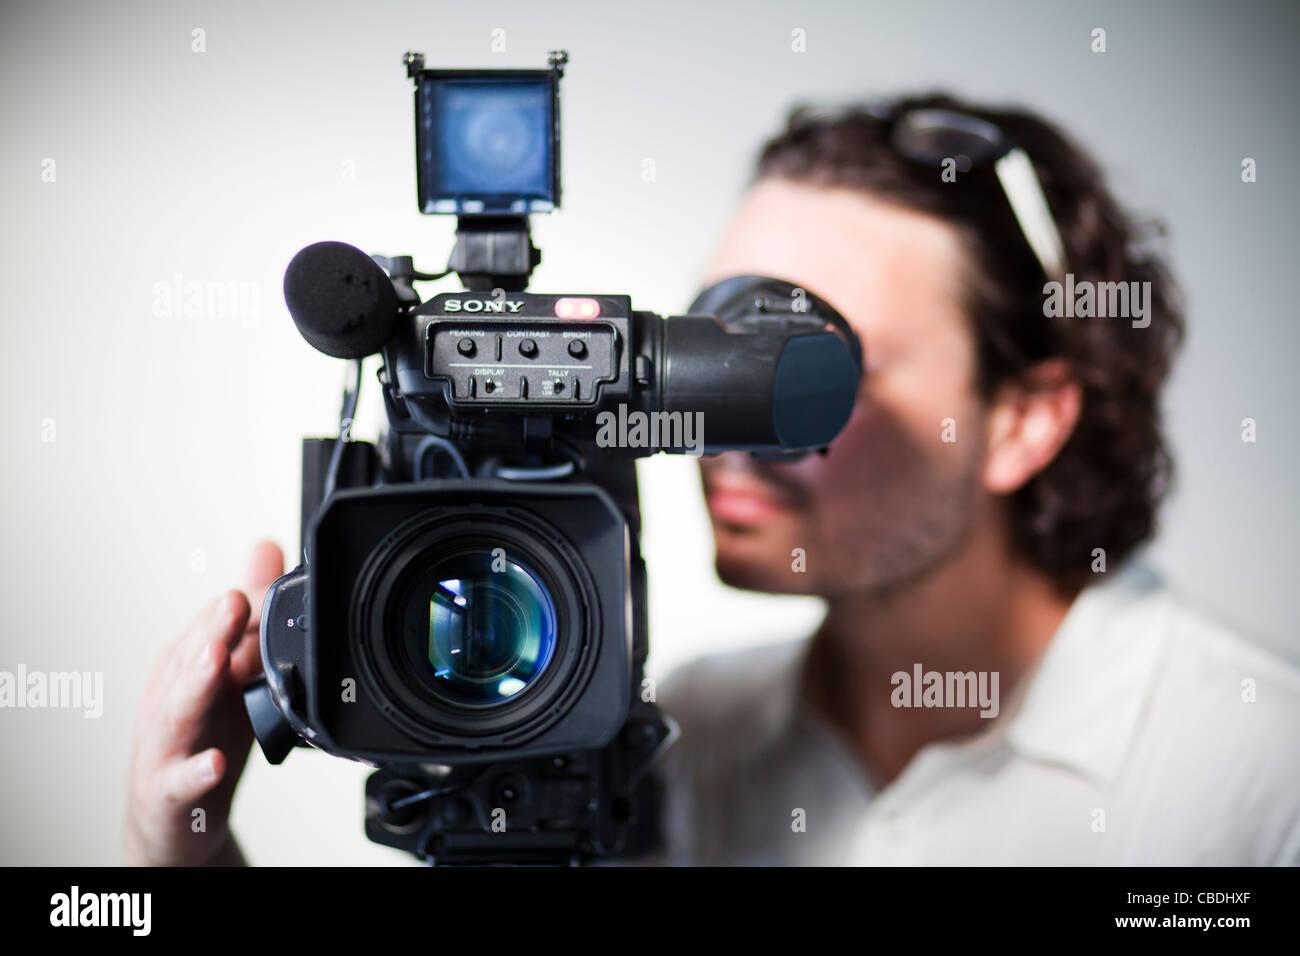 Cameraman with camera  TV, news, journalism, video, recoring